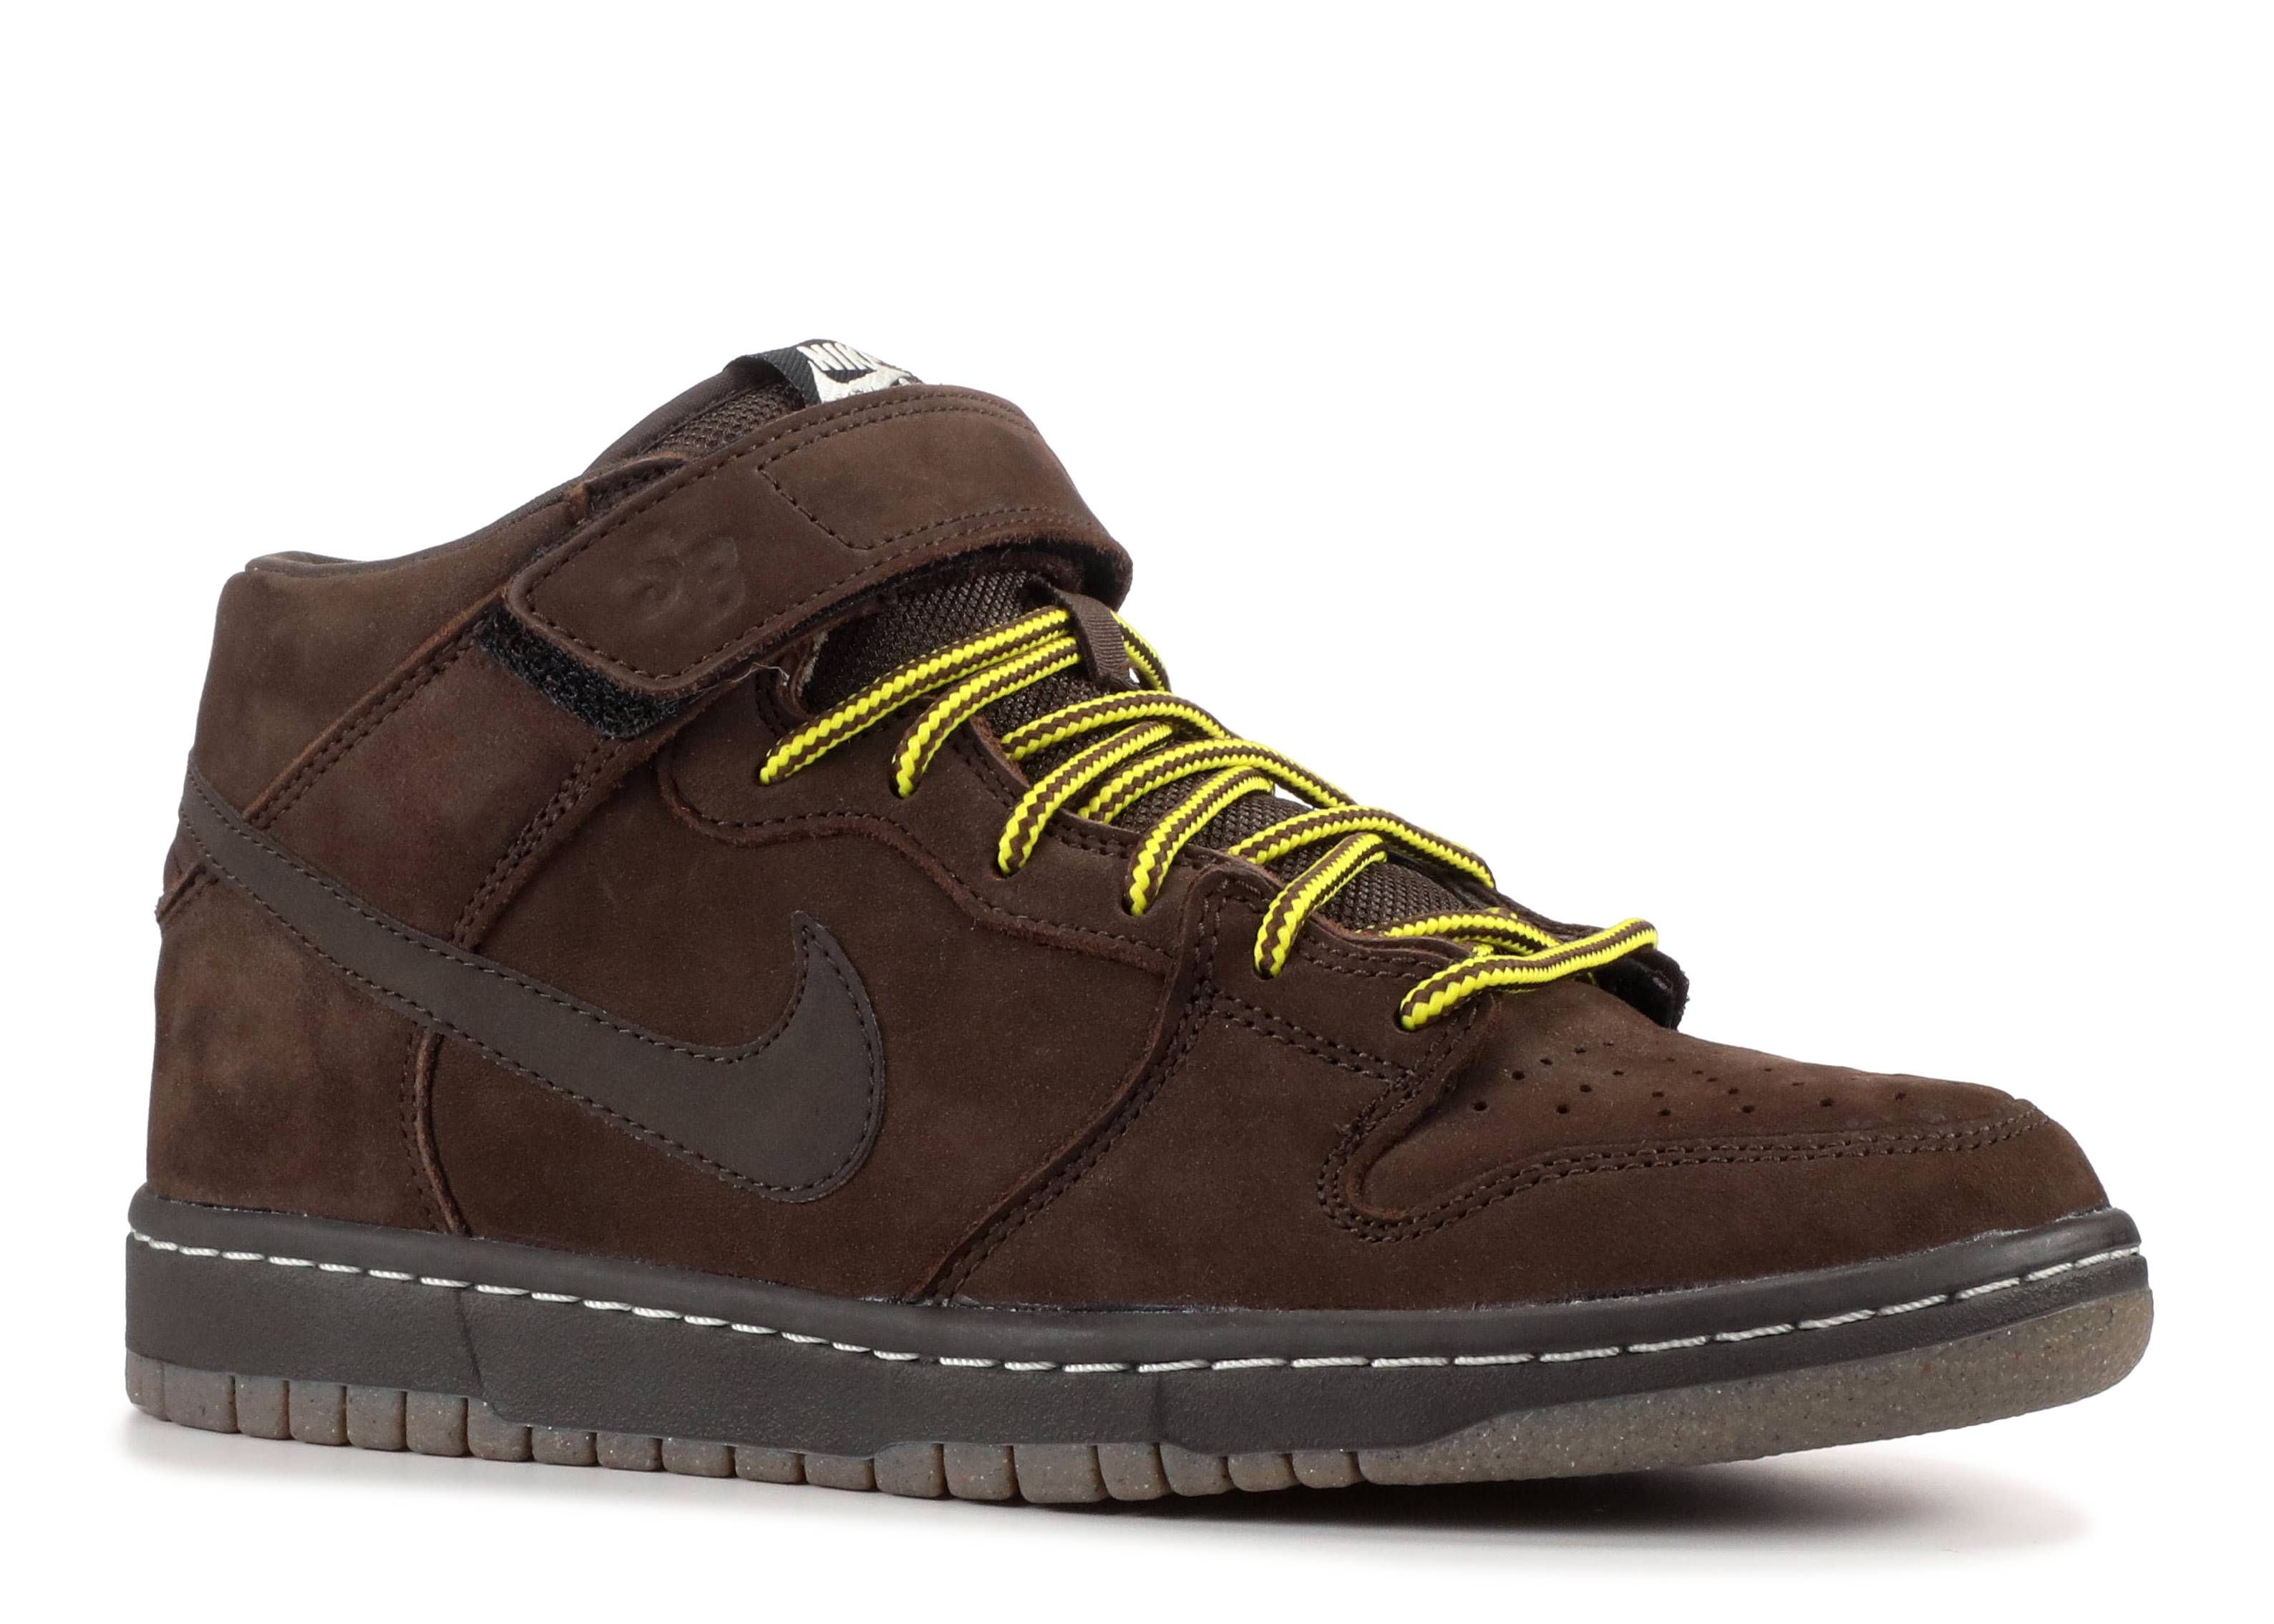 Dunk Mid Premium Sb - Nike - 314381 221 - dark chocolate dark ... 4795c075d1